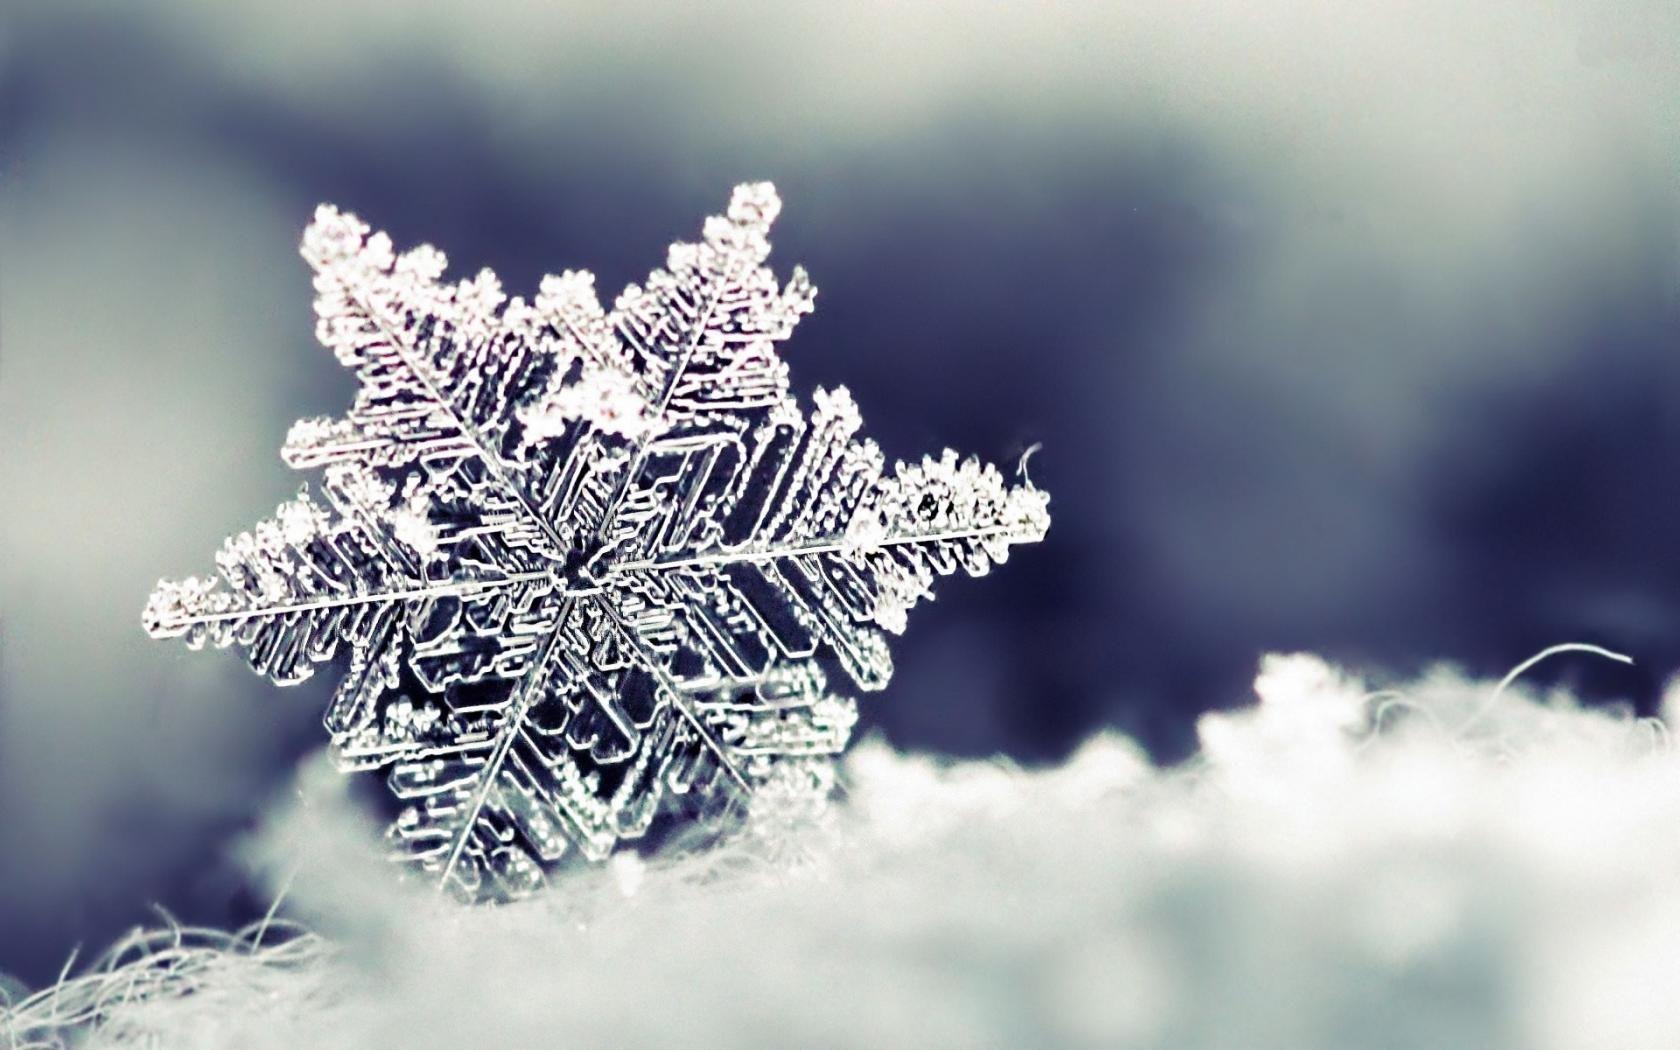 Desktop Wallpaper Backgrounds Snowflake Wallpaper Winter Wallpaper Snowflake Photography